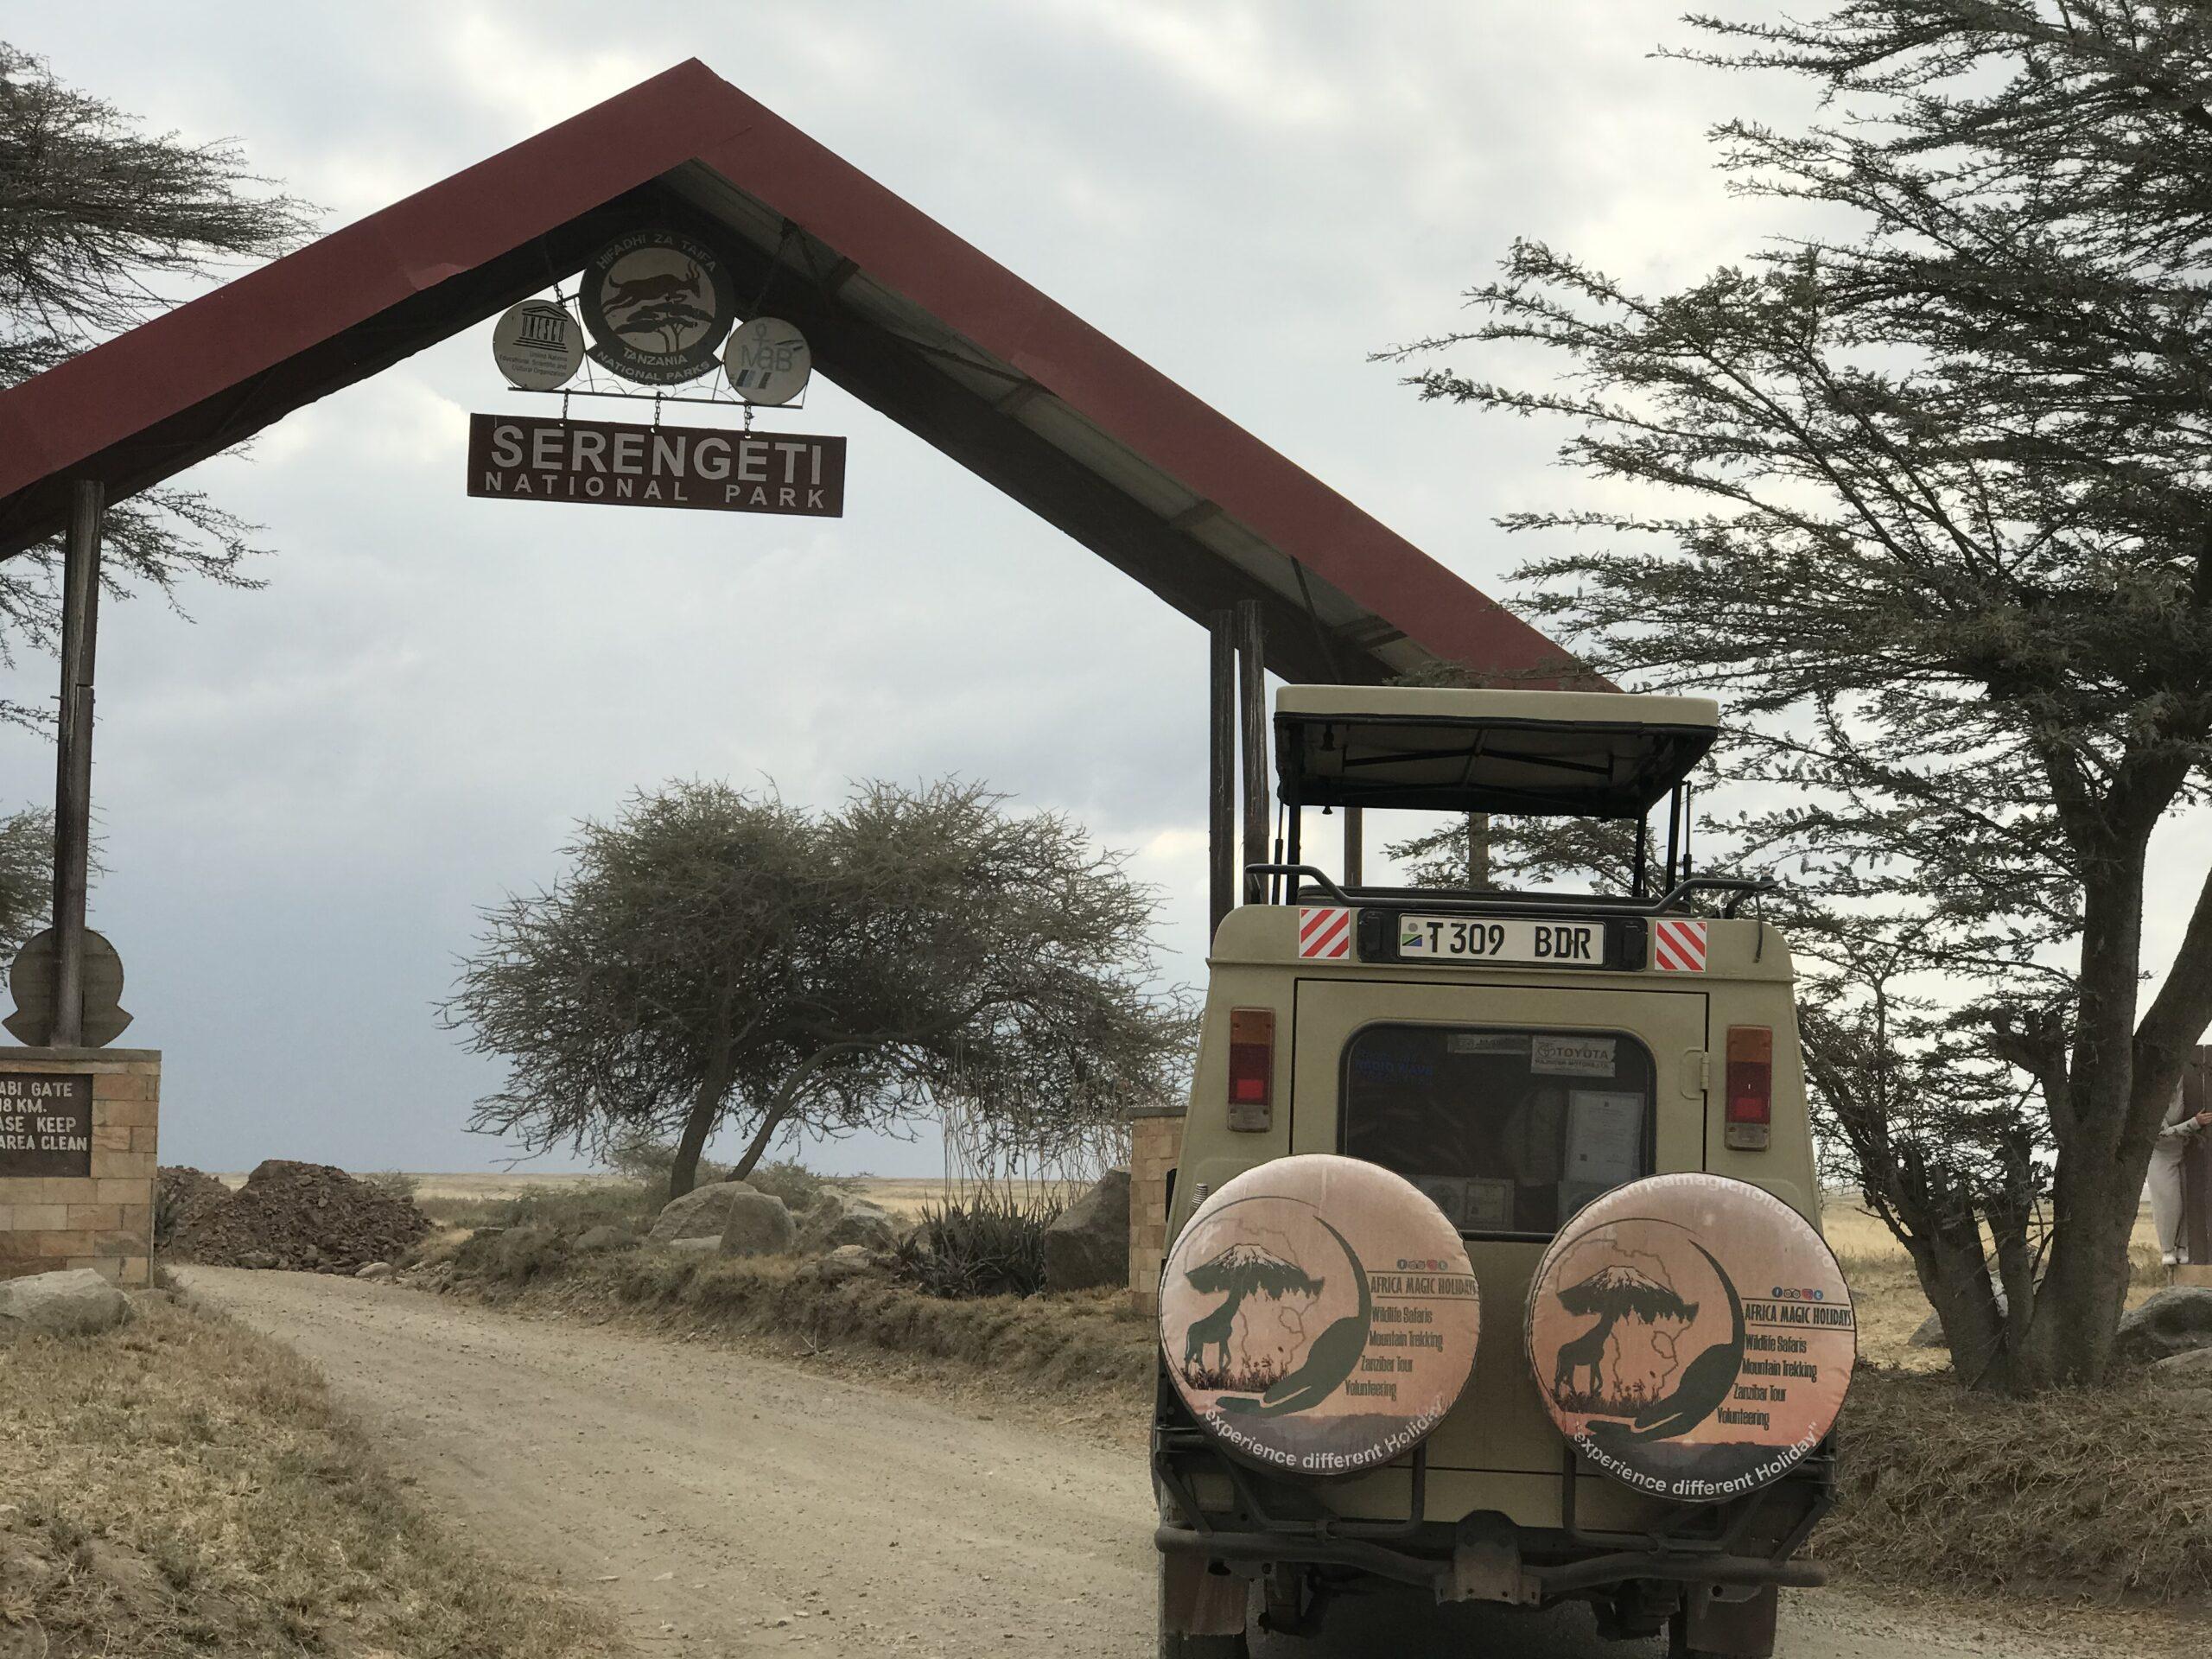 Africa Magic Holidays & Tours Ltd, Lazaro Mtui, Arusha, Tanzania